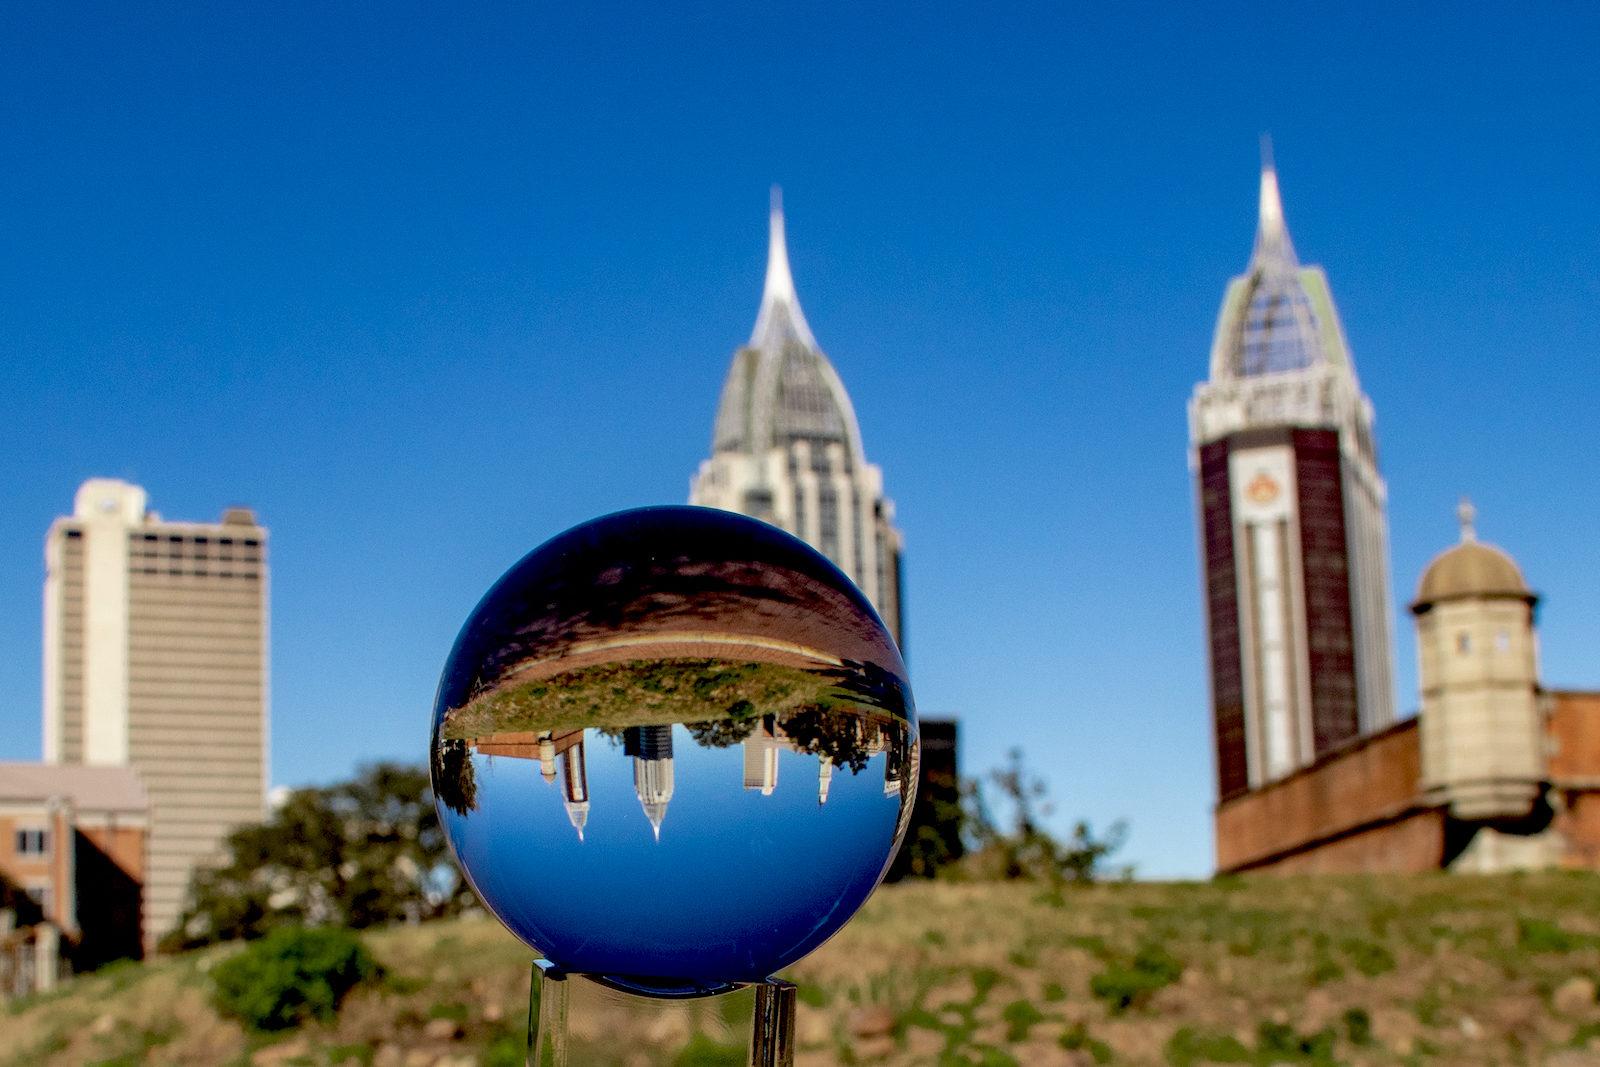 Downtown Mobile, AL through glass ball